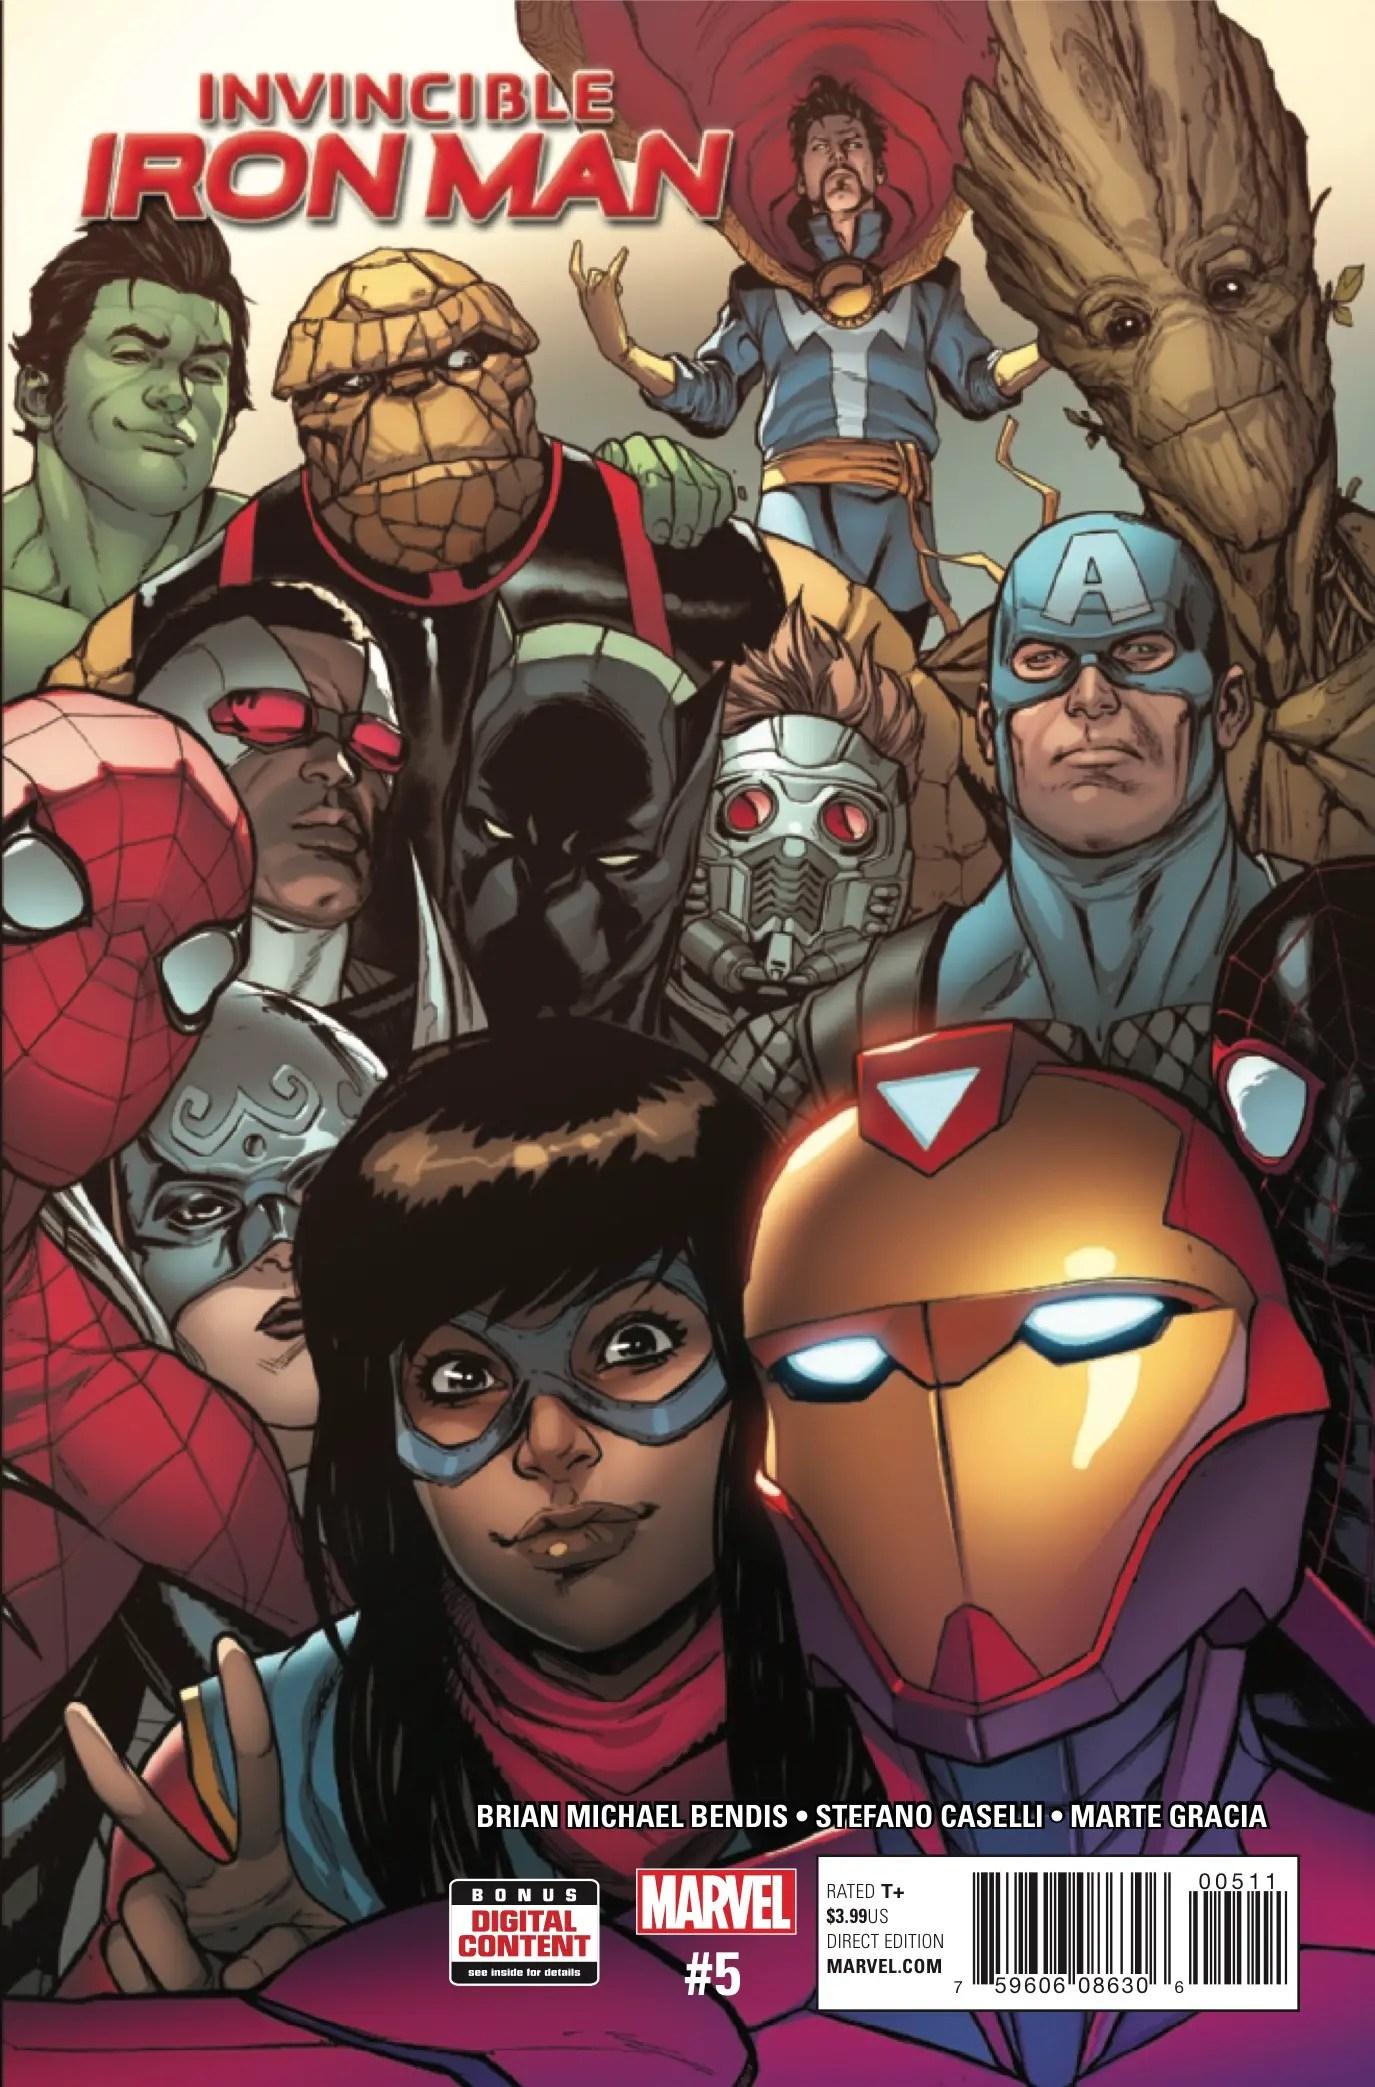 Invincible Iron Man #5 Review